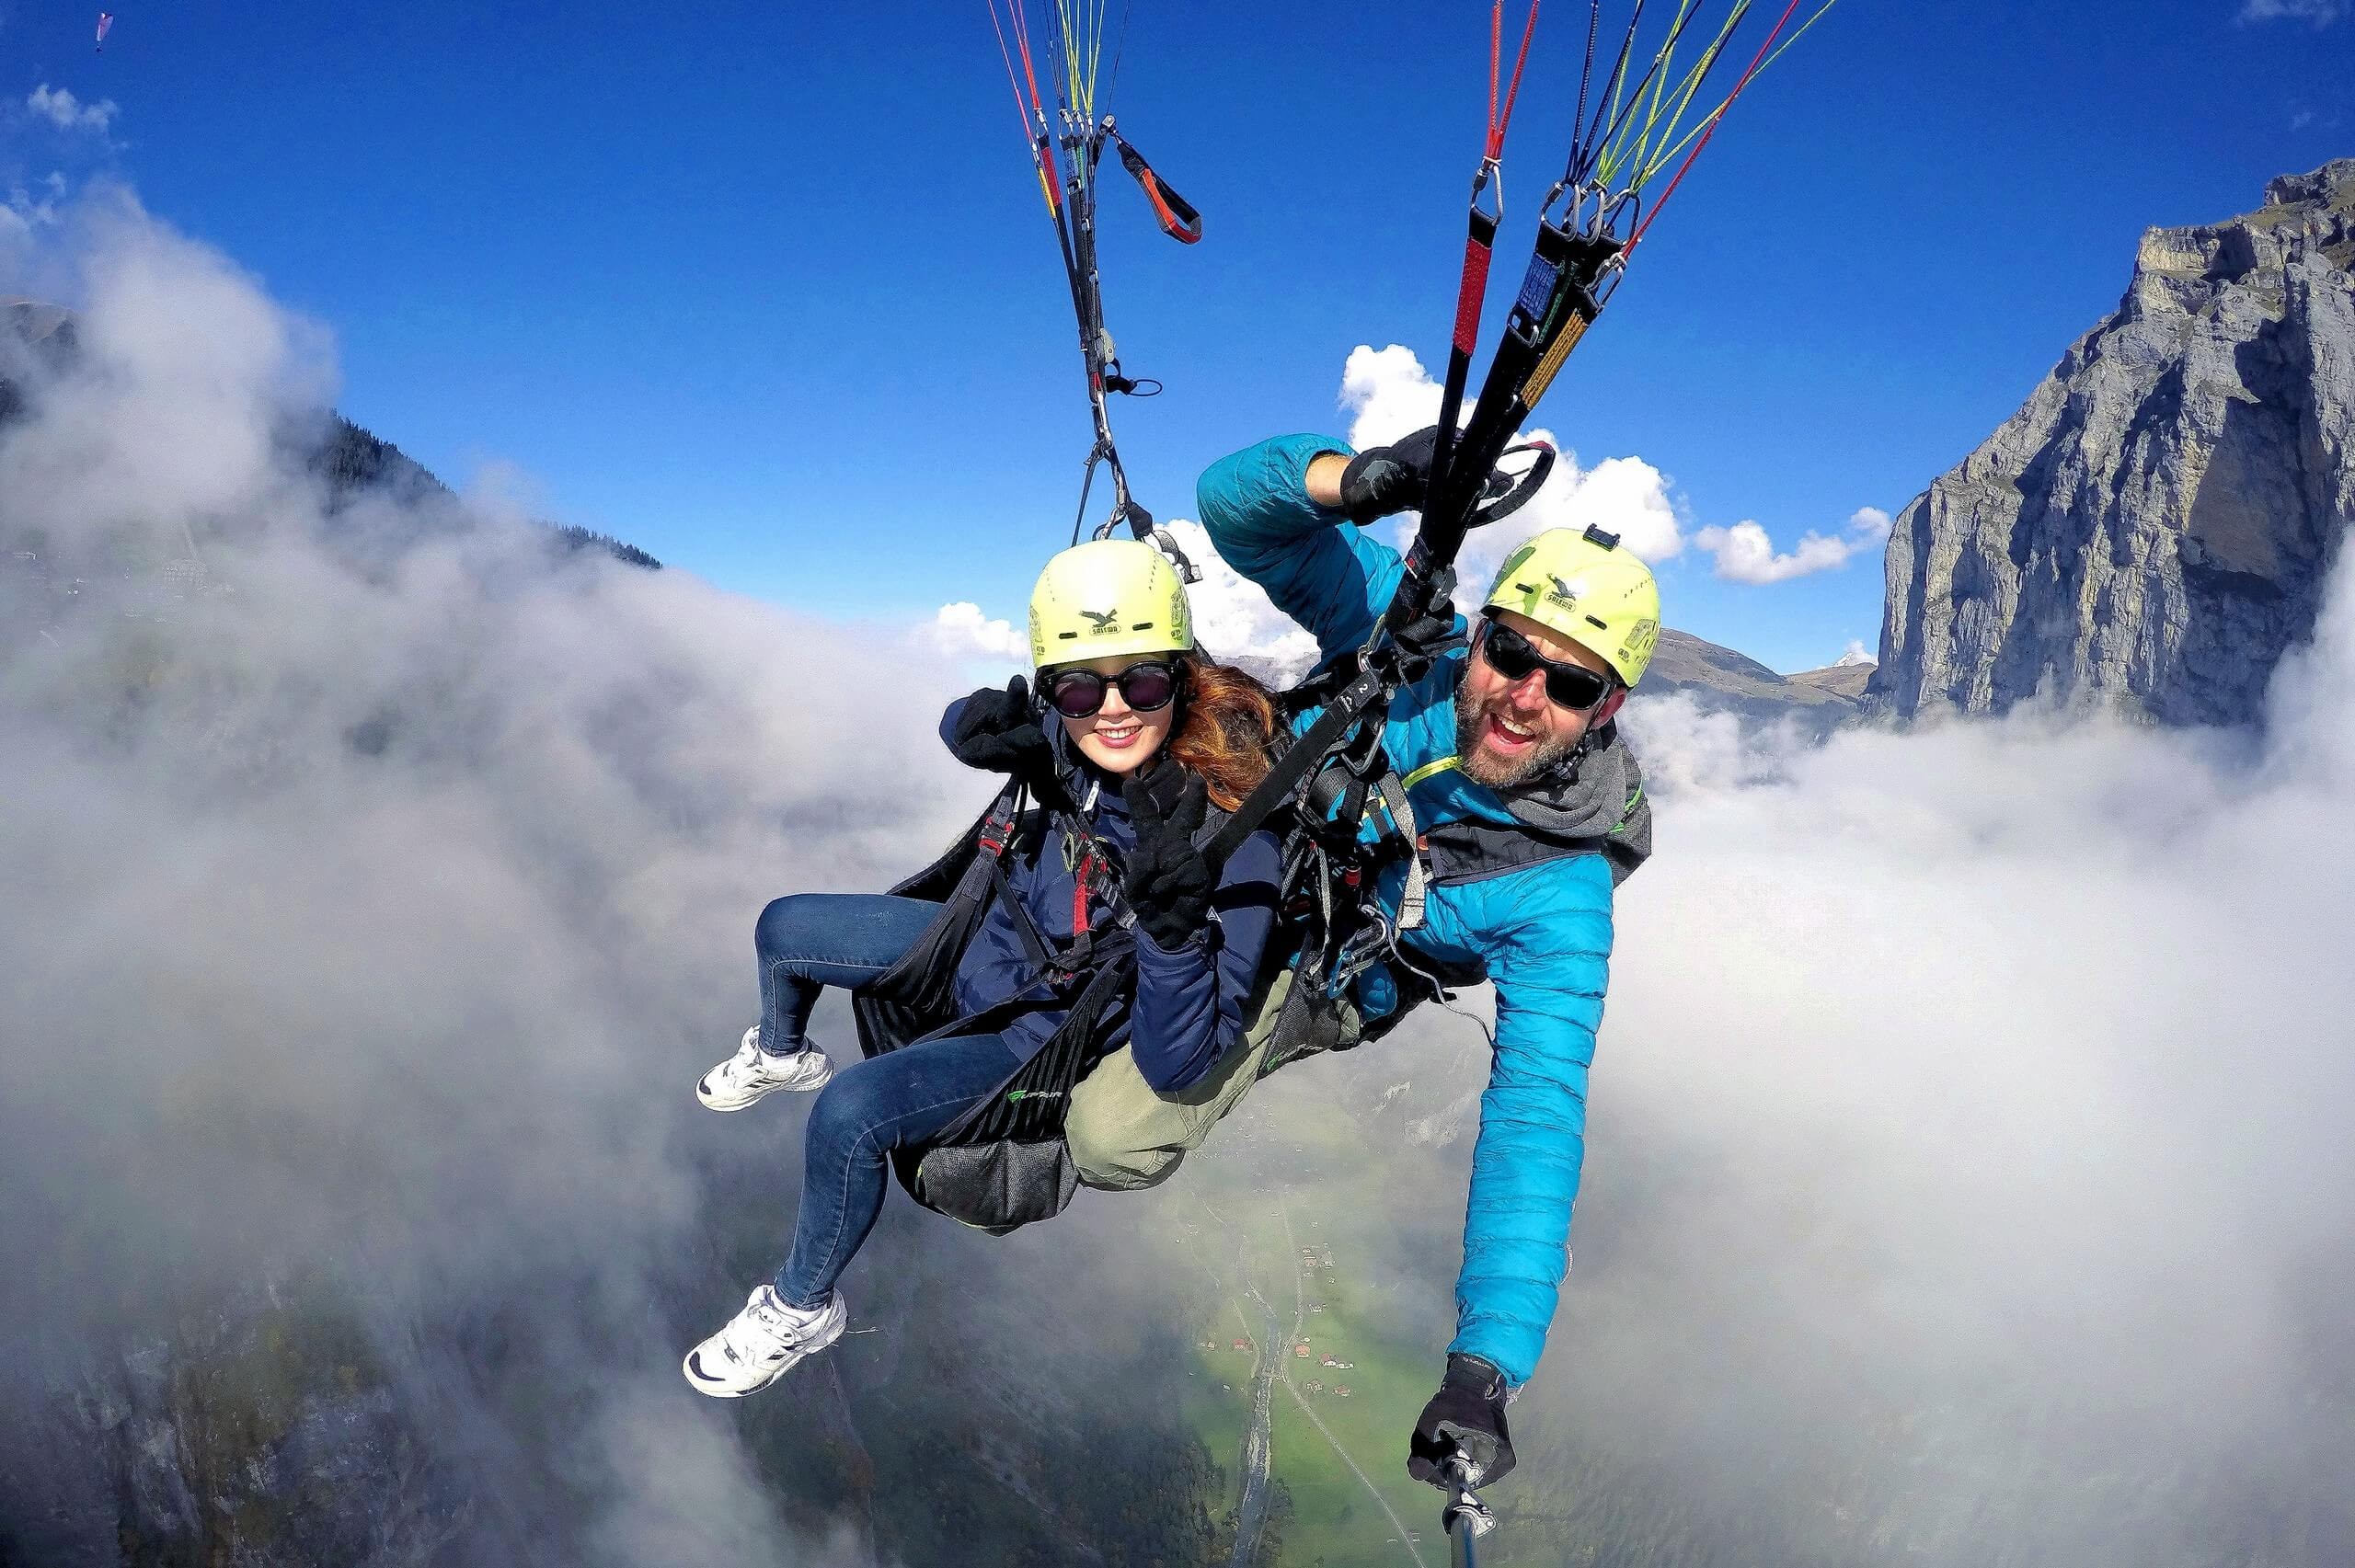 interlaken-paragliding-alpinair-herbst-nebel